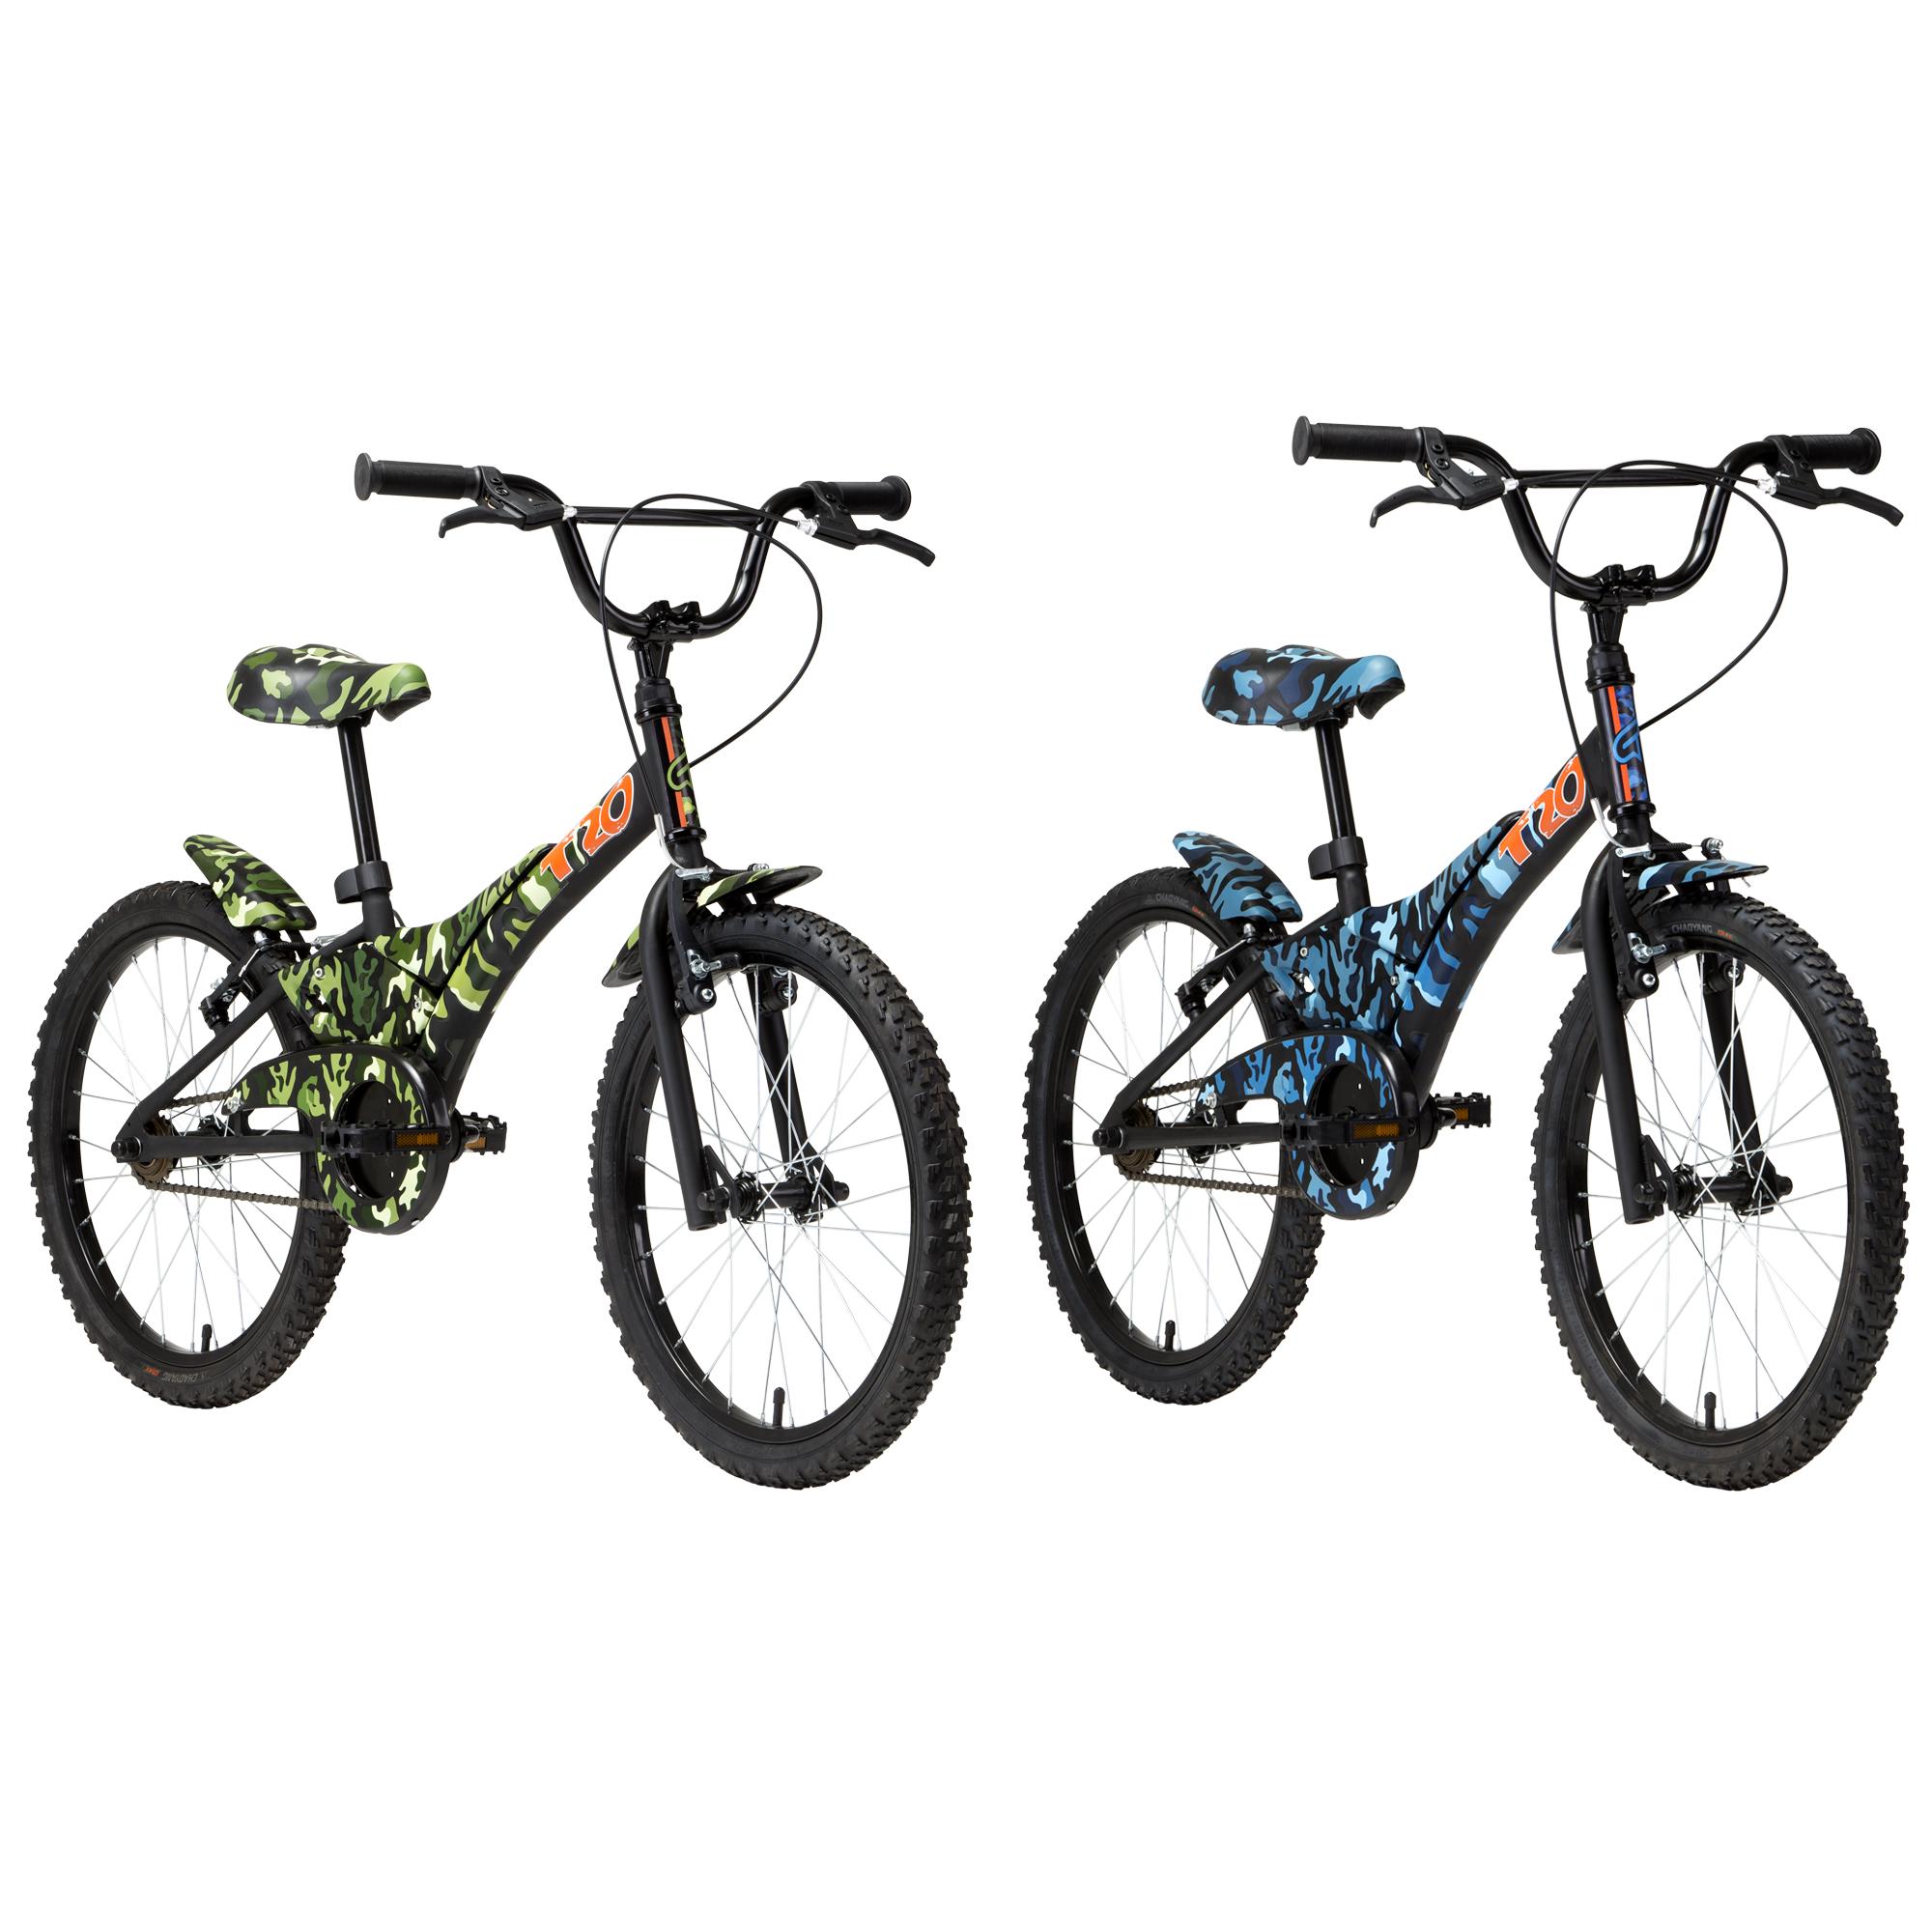 Bicicleta-Groove-T20-00